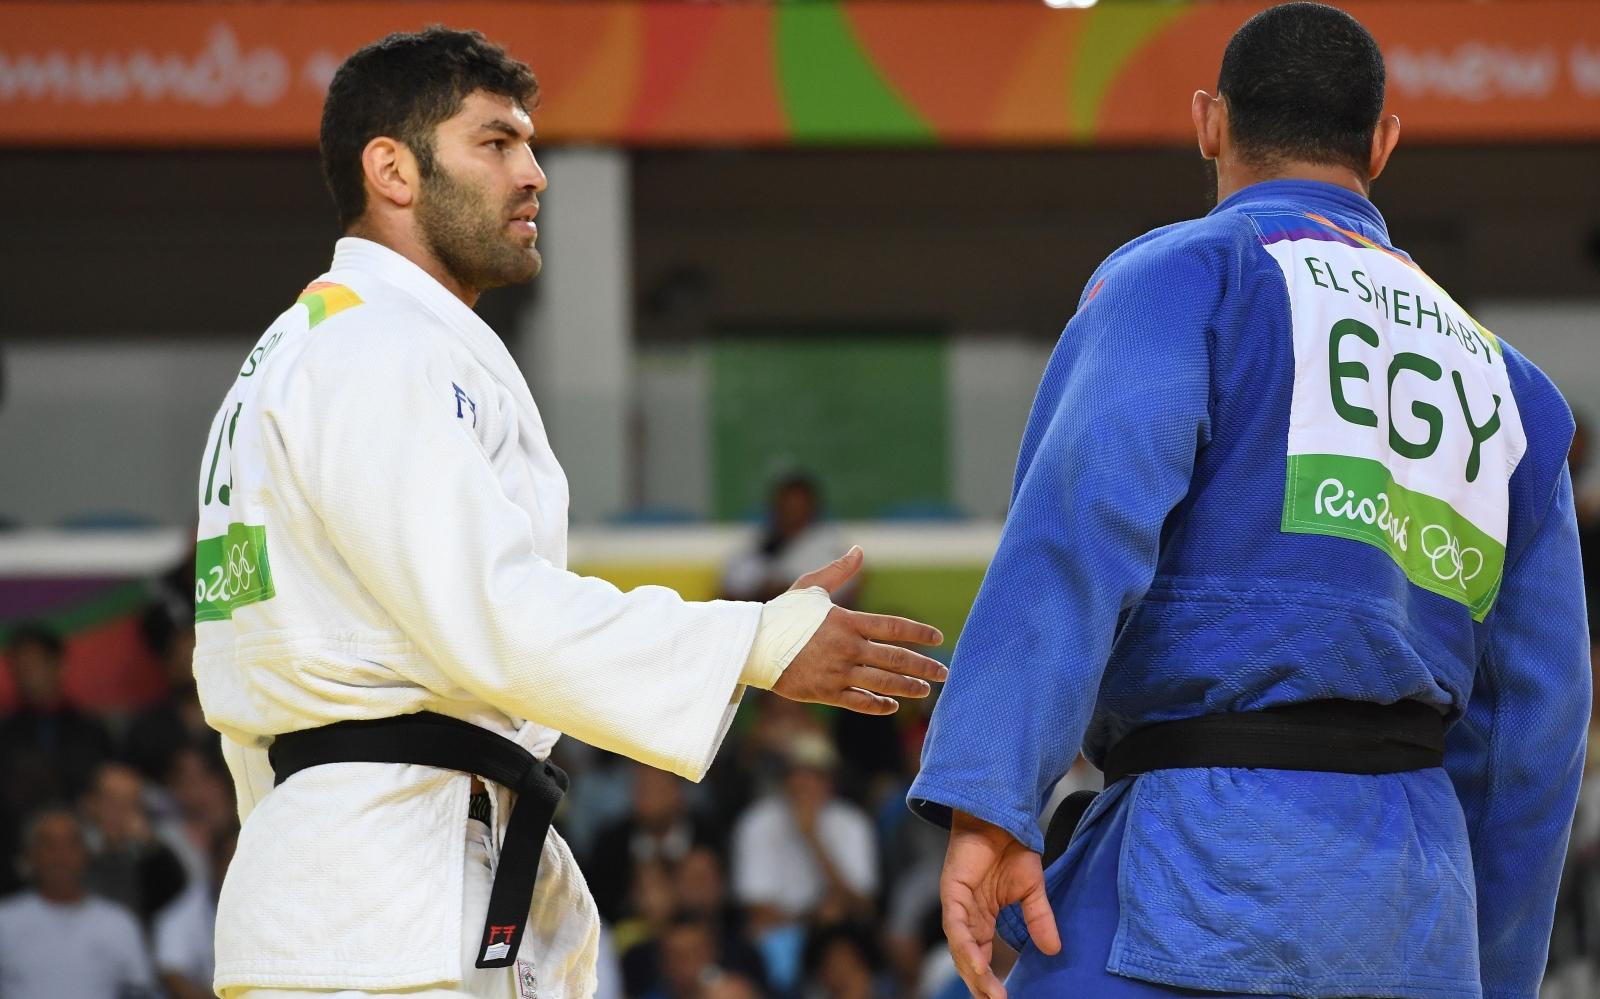 Judo handshake snub